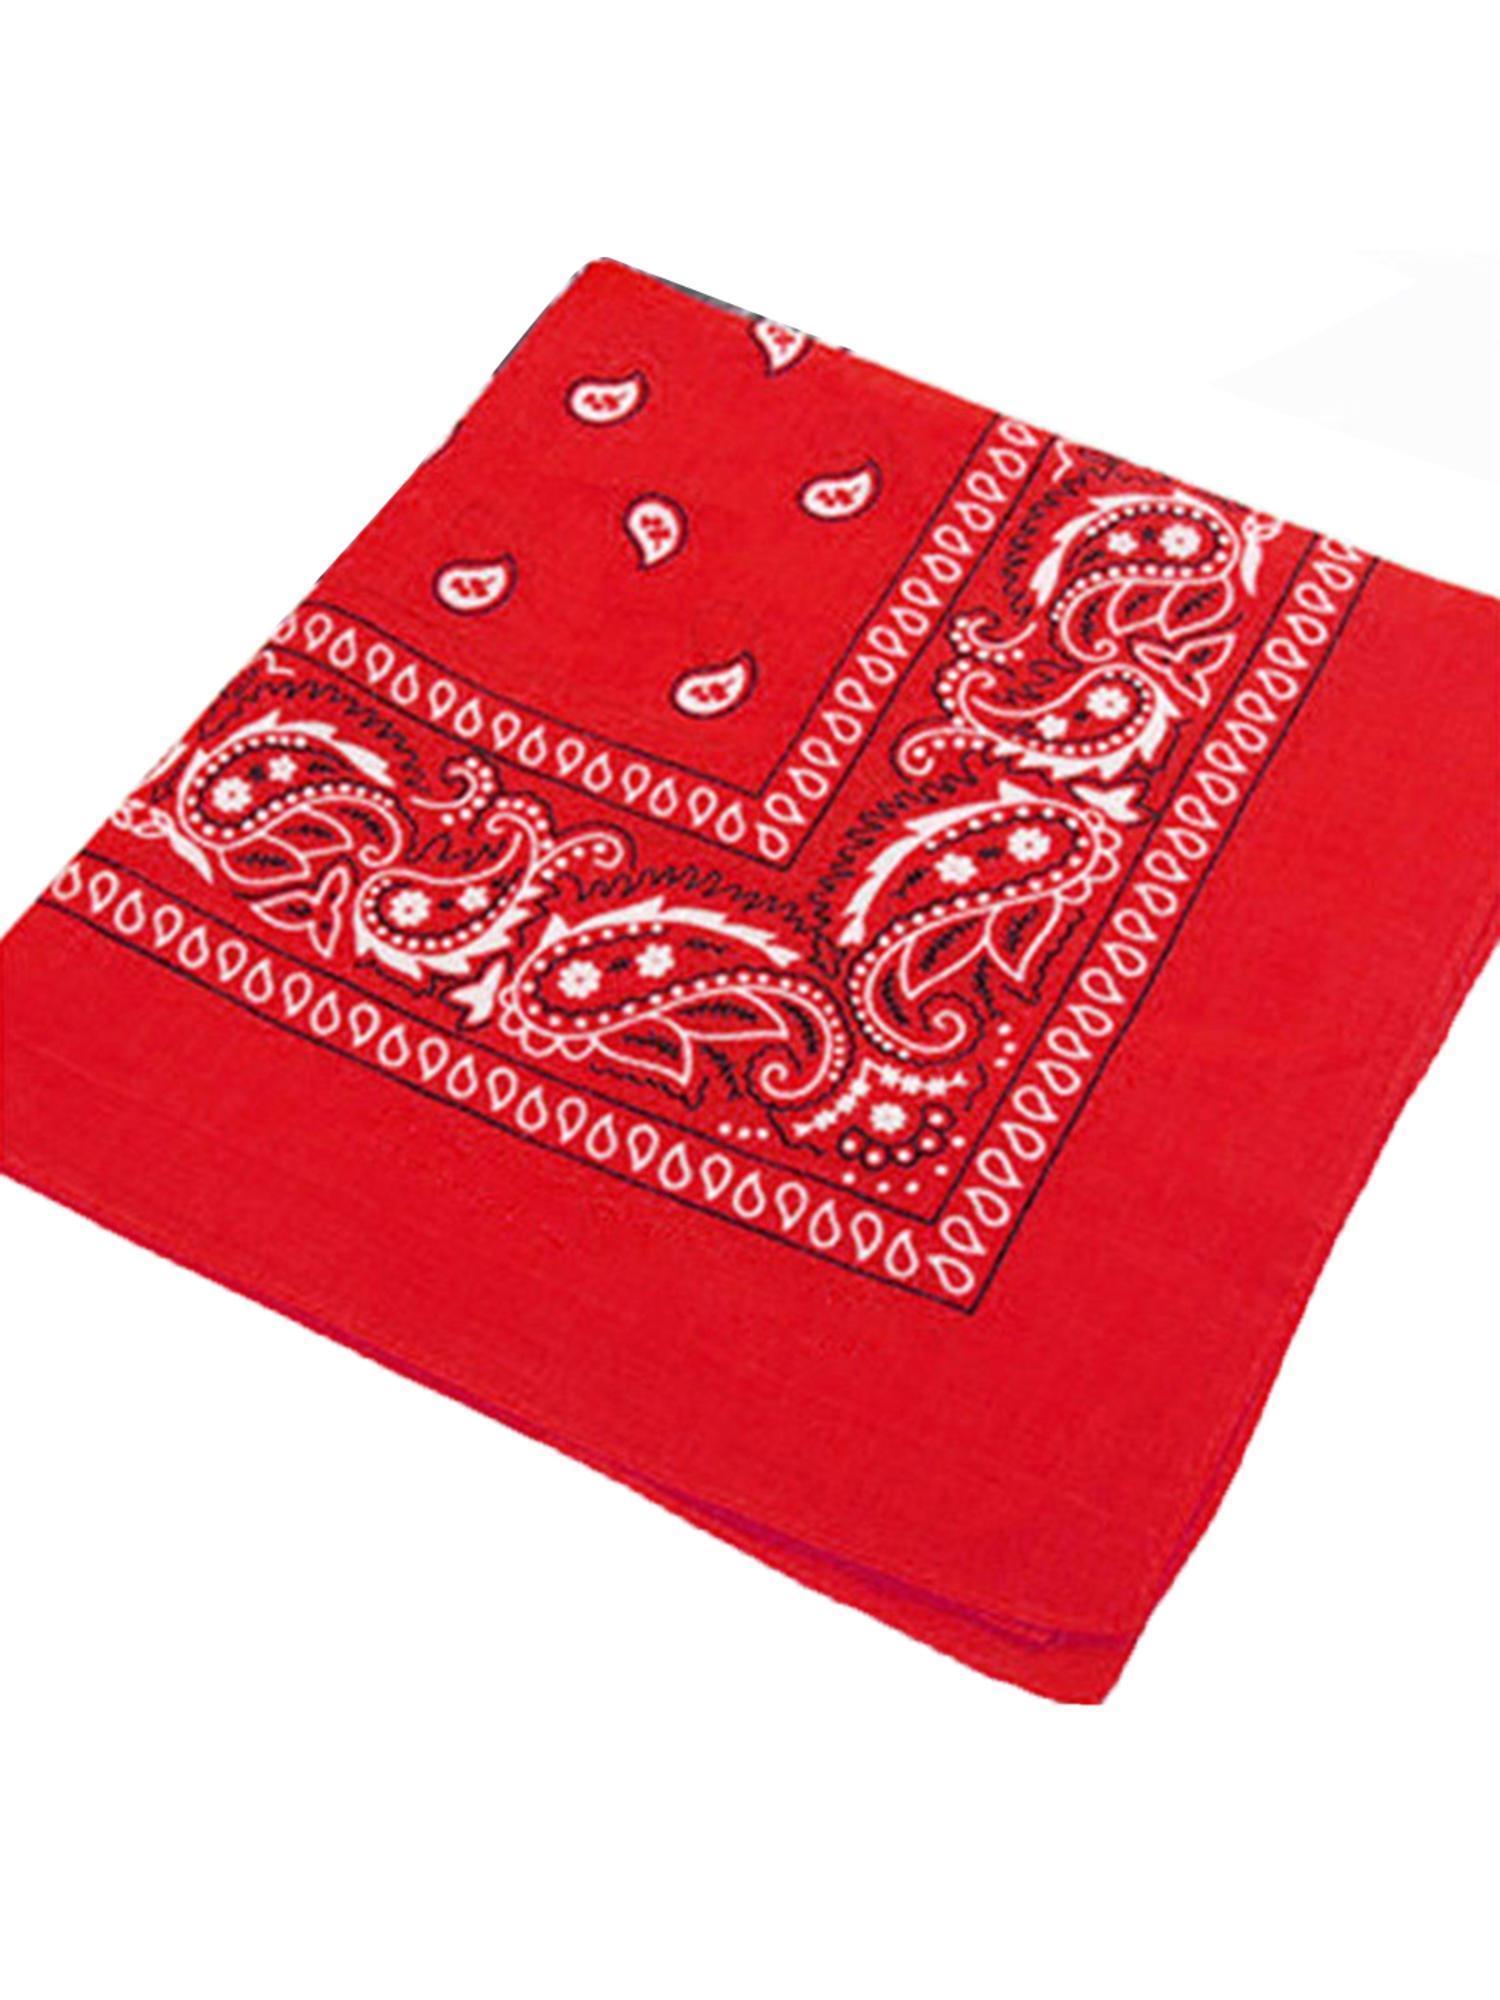 New PAISLEY BANDANA Head Band Wear Bands Scarf Neck Wrist Wrap polyester Cotton